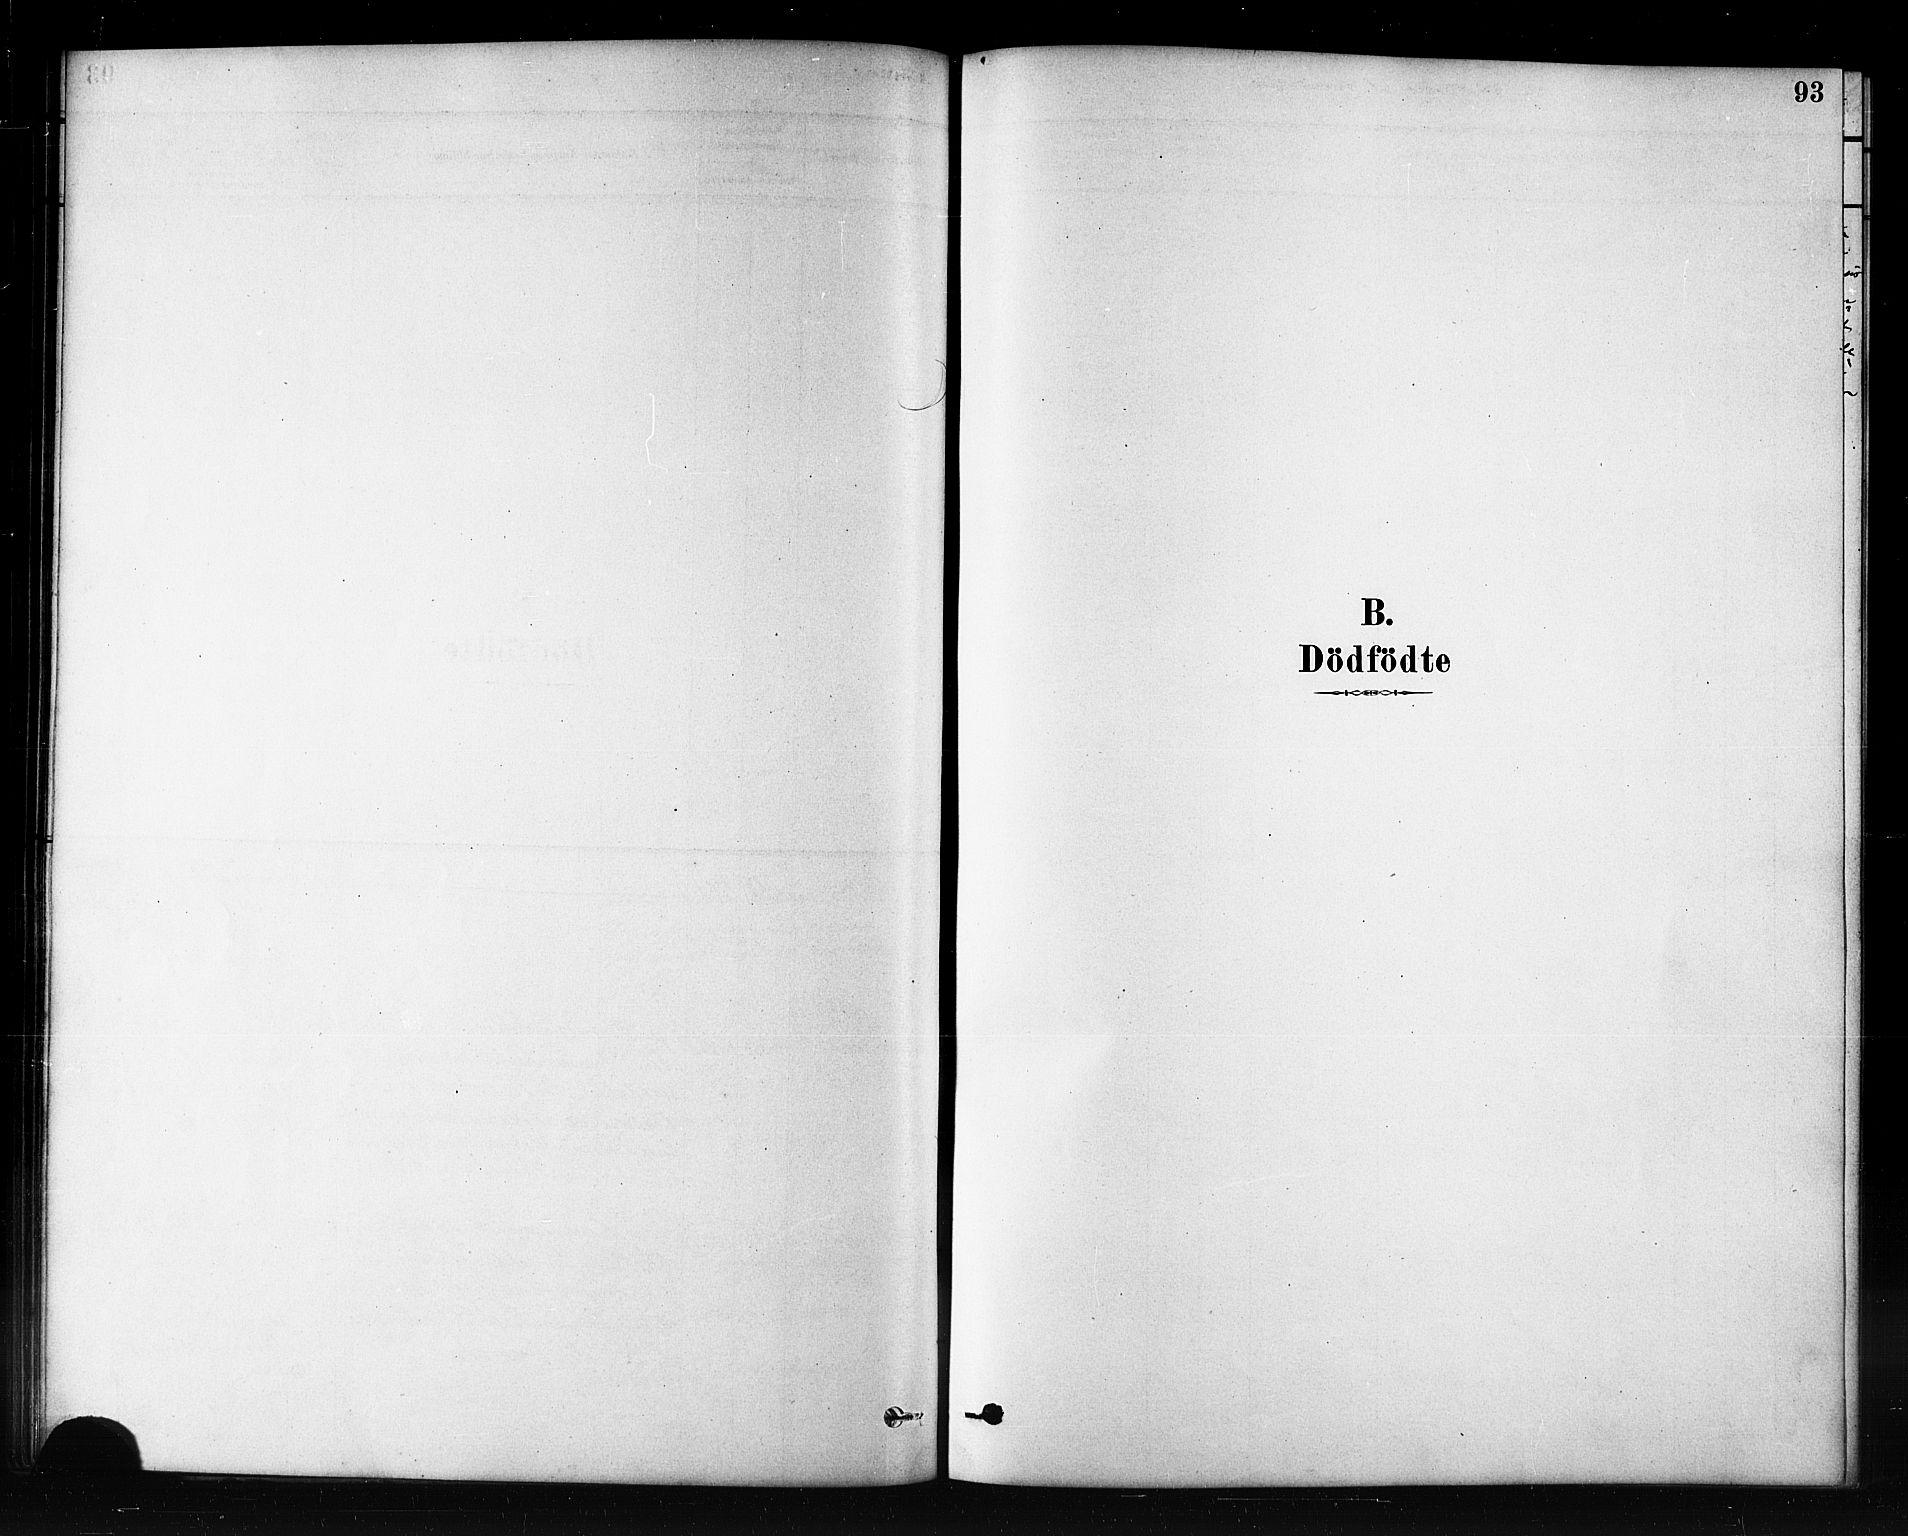 SATØ, Kautokeino sokneprestembete, H/Hb/L0002.klokk: Klokkerbok nr. 2, 1877-1896, s. 93